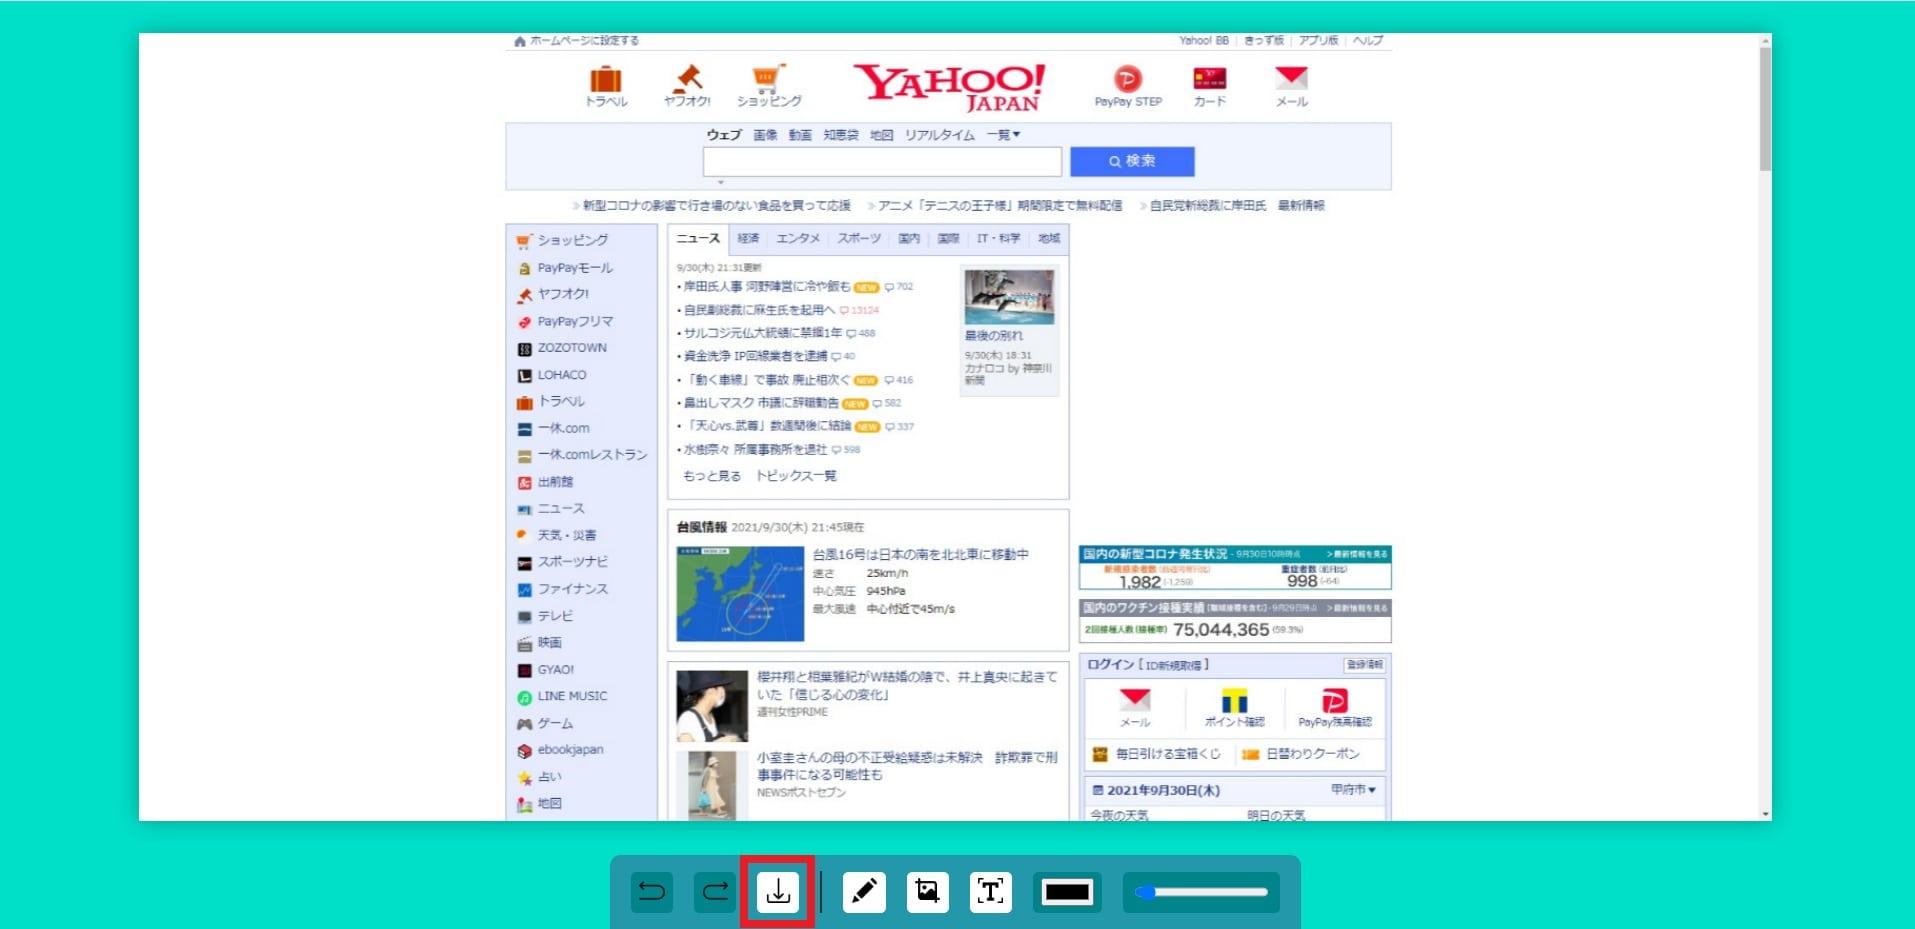 「Screenshot Tool」を使用して作成したWebブラウザ画面の画像を編集する画面